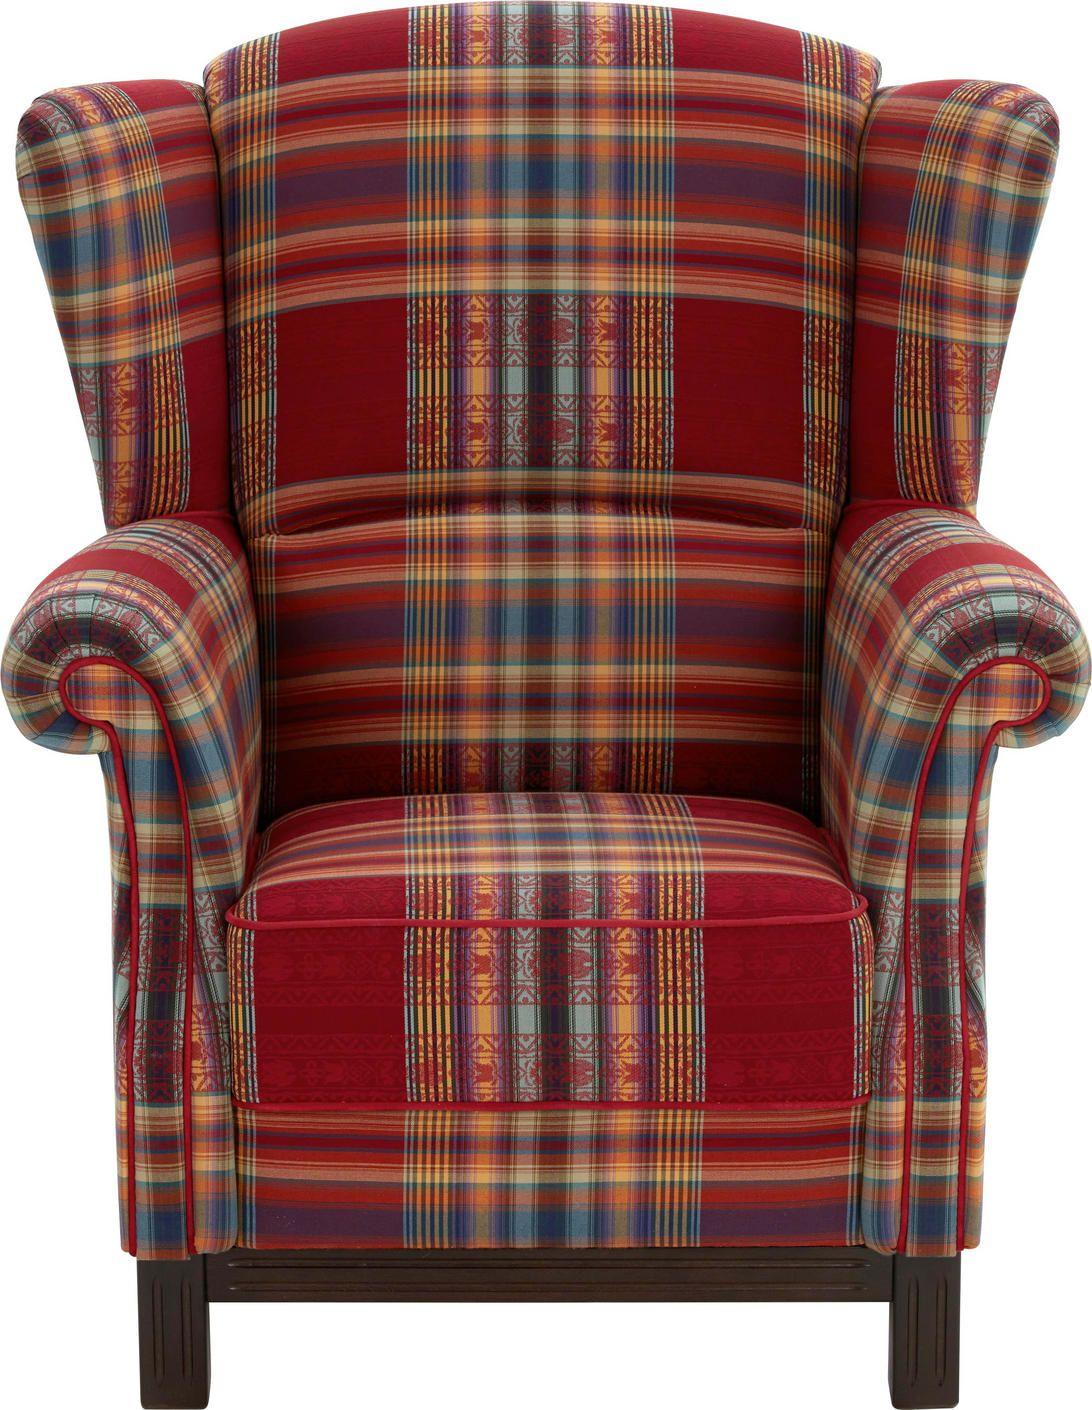 Sessel In Textil Multicolor Sessel Ohrensessel Bunt Und Ohrensessel